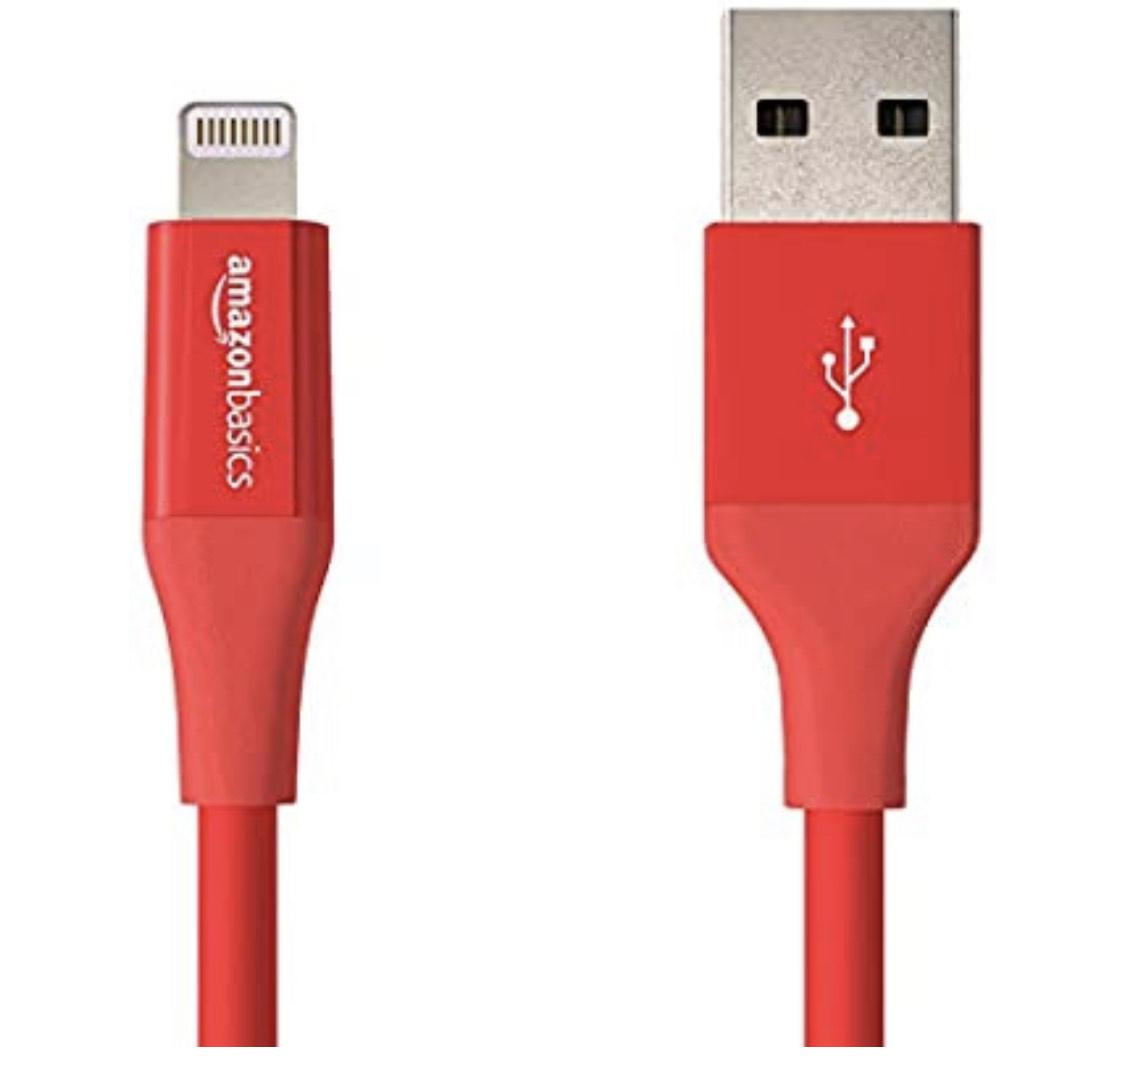 AmazonBasics Lightning auf USB A Kabel 1,8m , Rot, Apple MFi Zertifiziert Prime